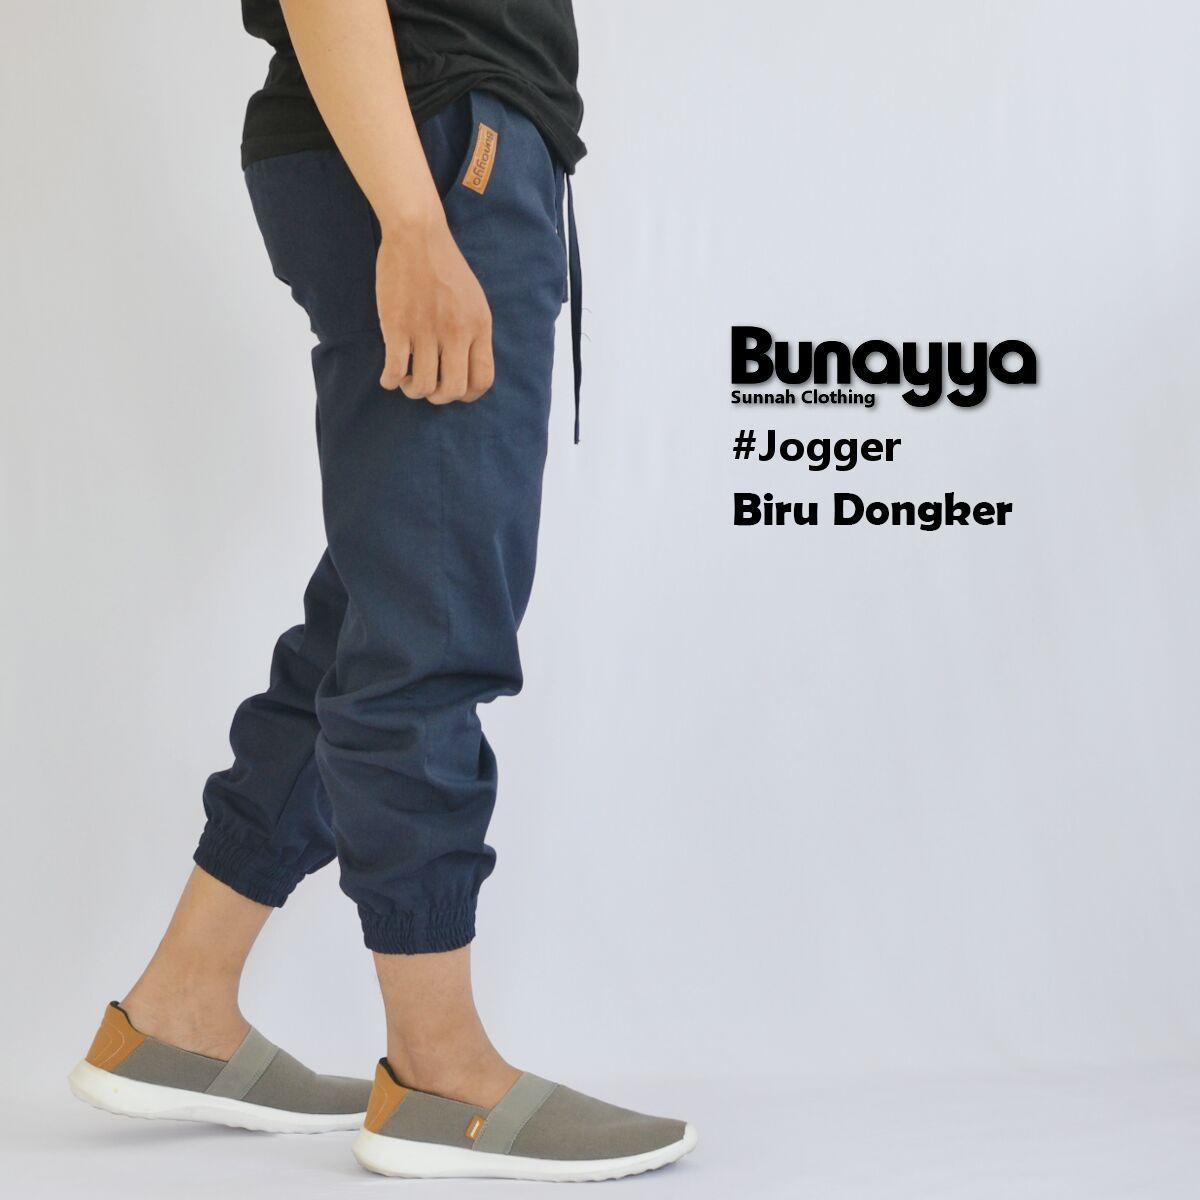 Buy Sell Cheapest Sirwal Bunayya Celana Best Quality Product Deals Laa Isbaal Jogger Pants Original Panjang Pria Joger Warna Coklat Hitam Dan Dongker